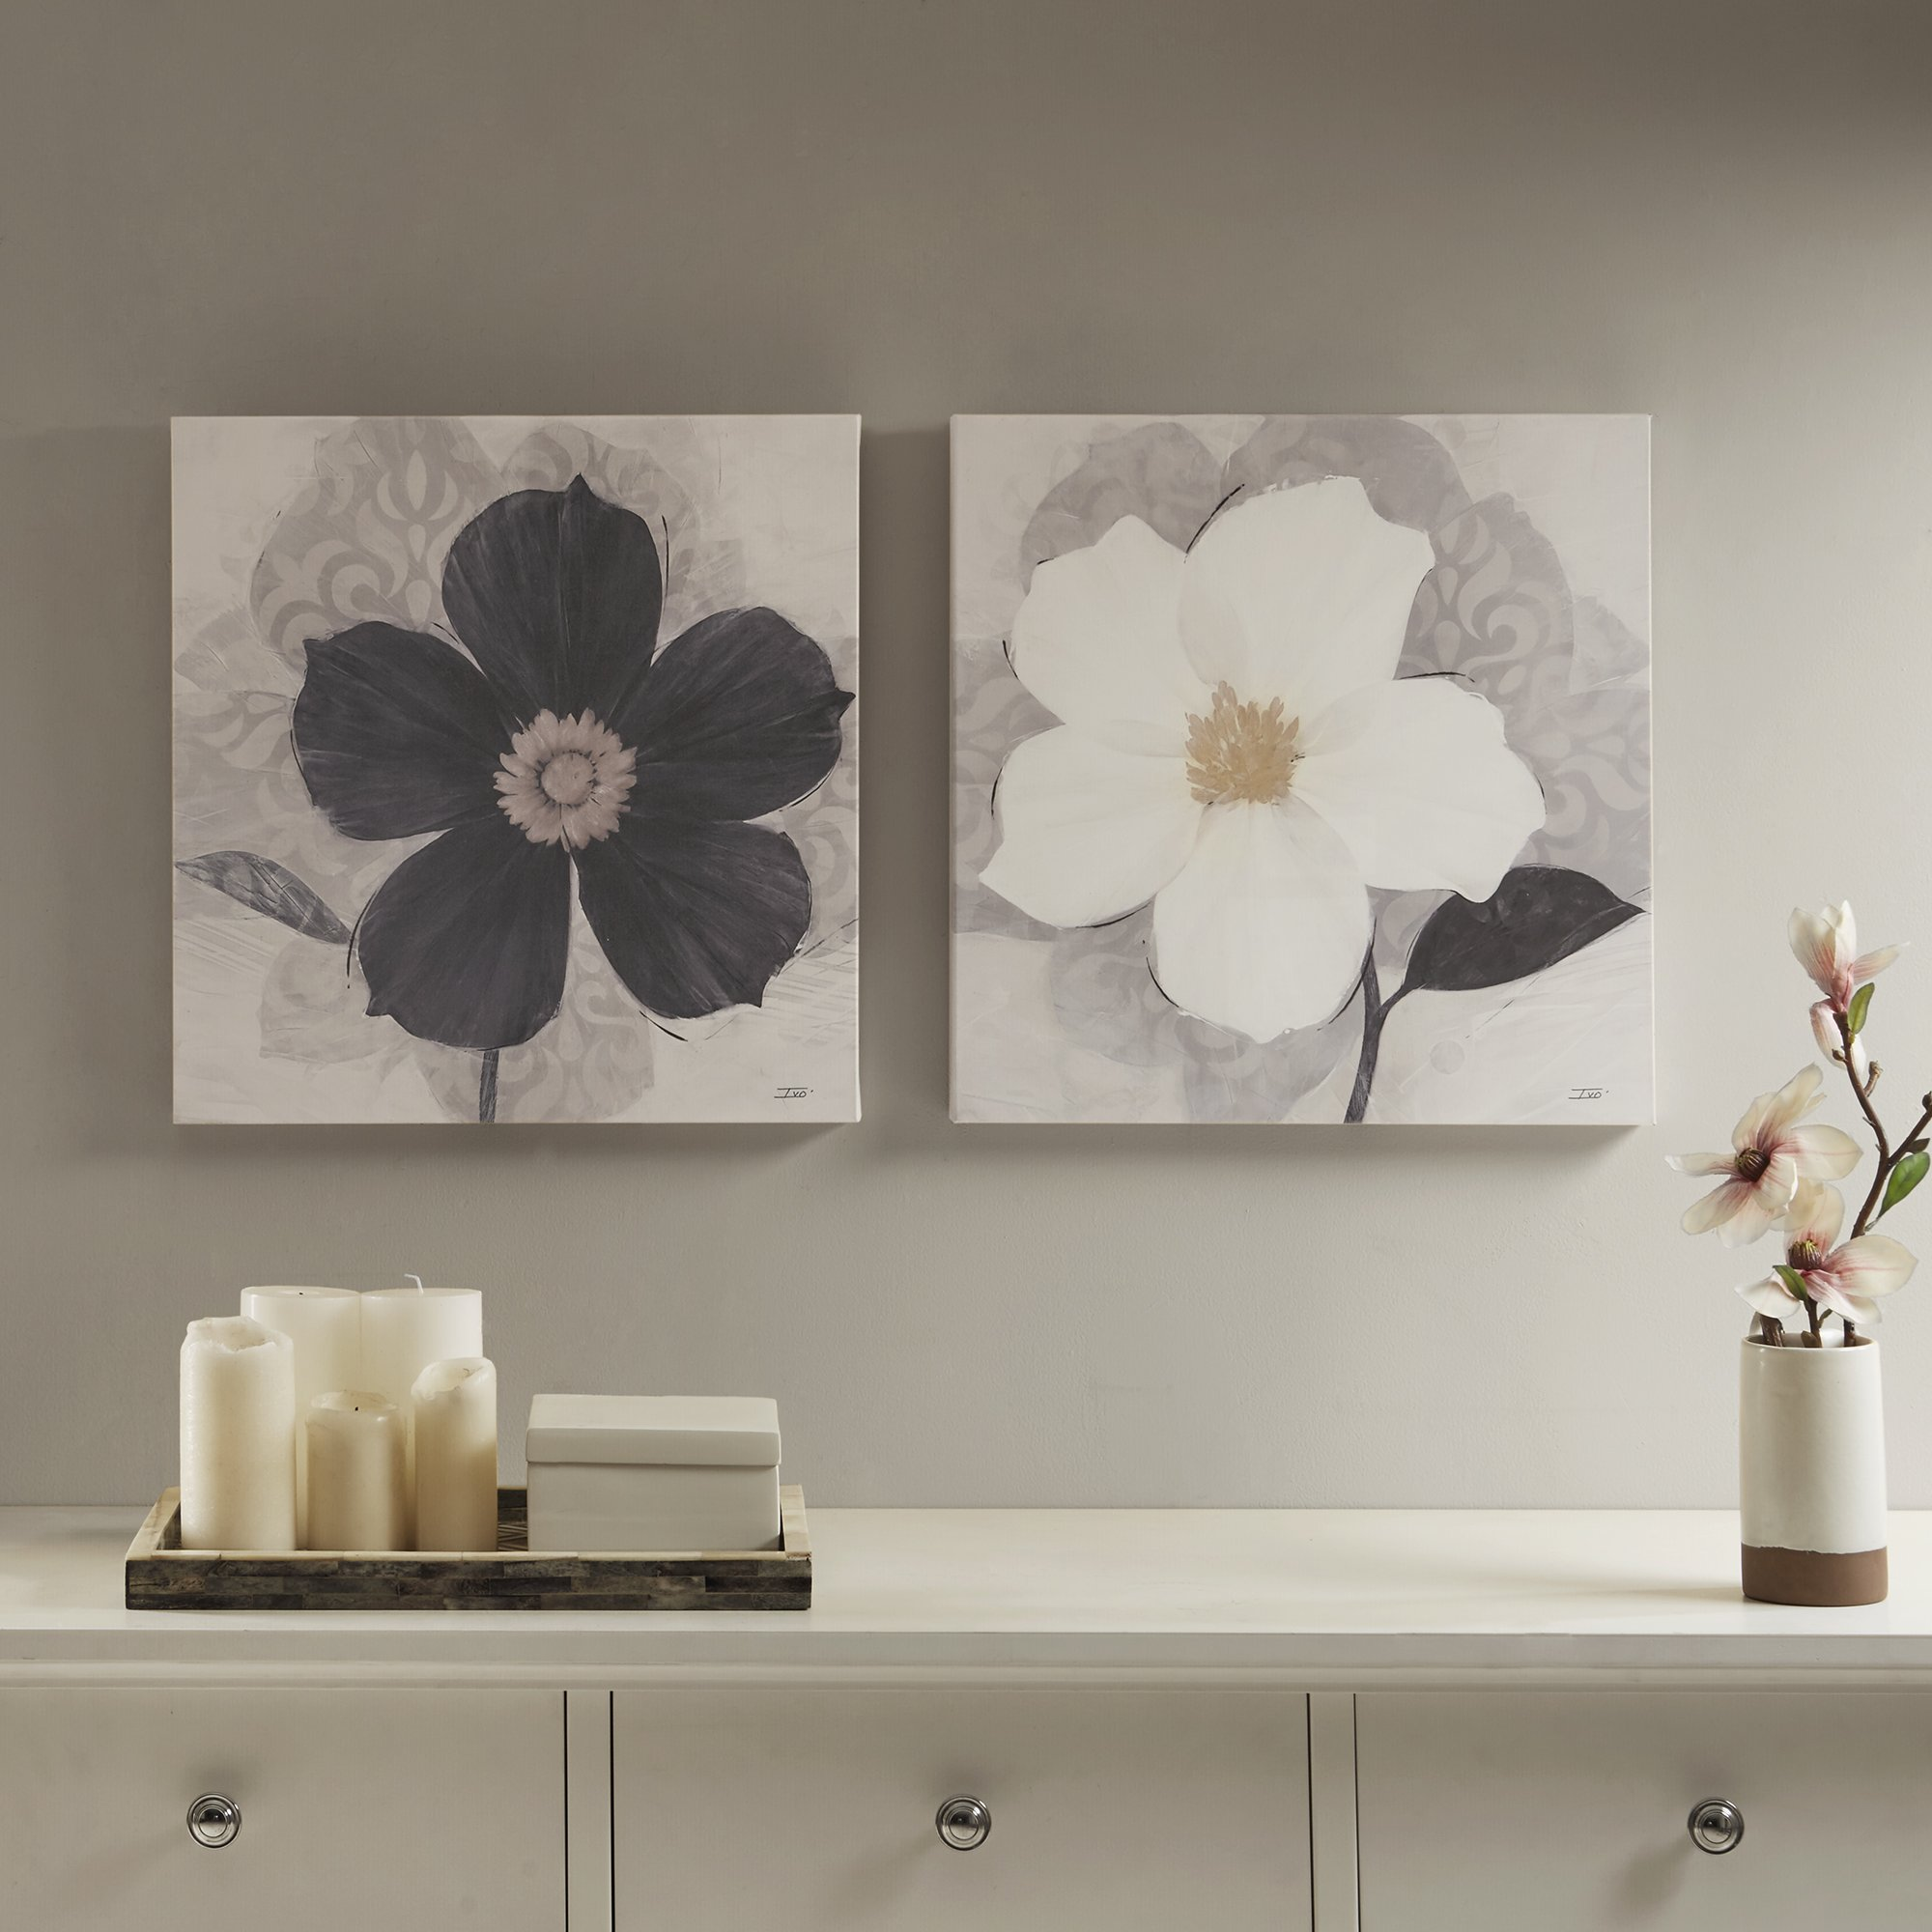 Décor 5 Printed Canvas Set - 2 Pieces, 18'' x 18'' - Blooms Floral - Black and White Flower